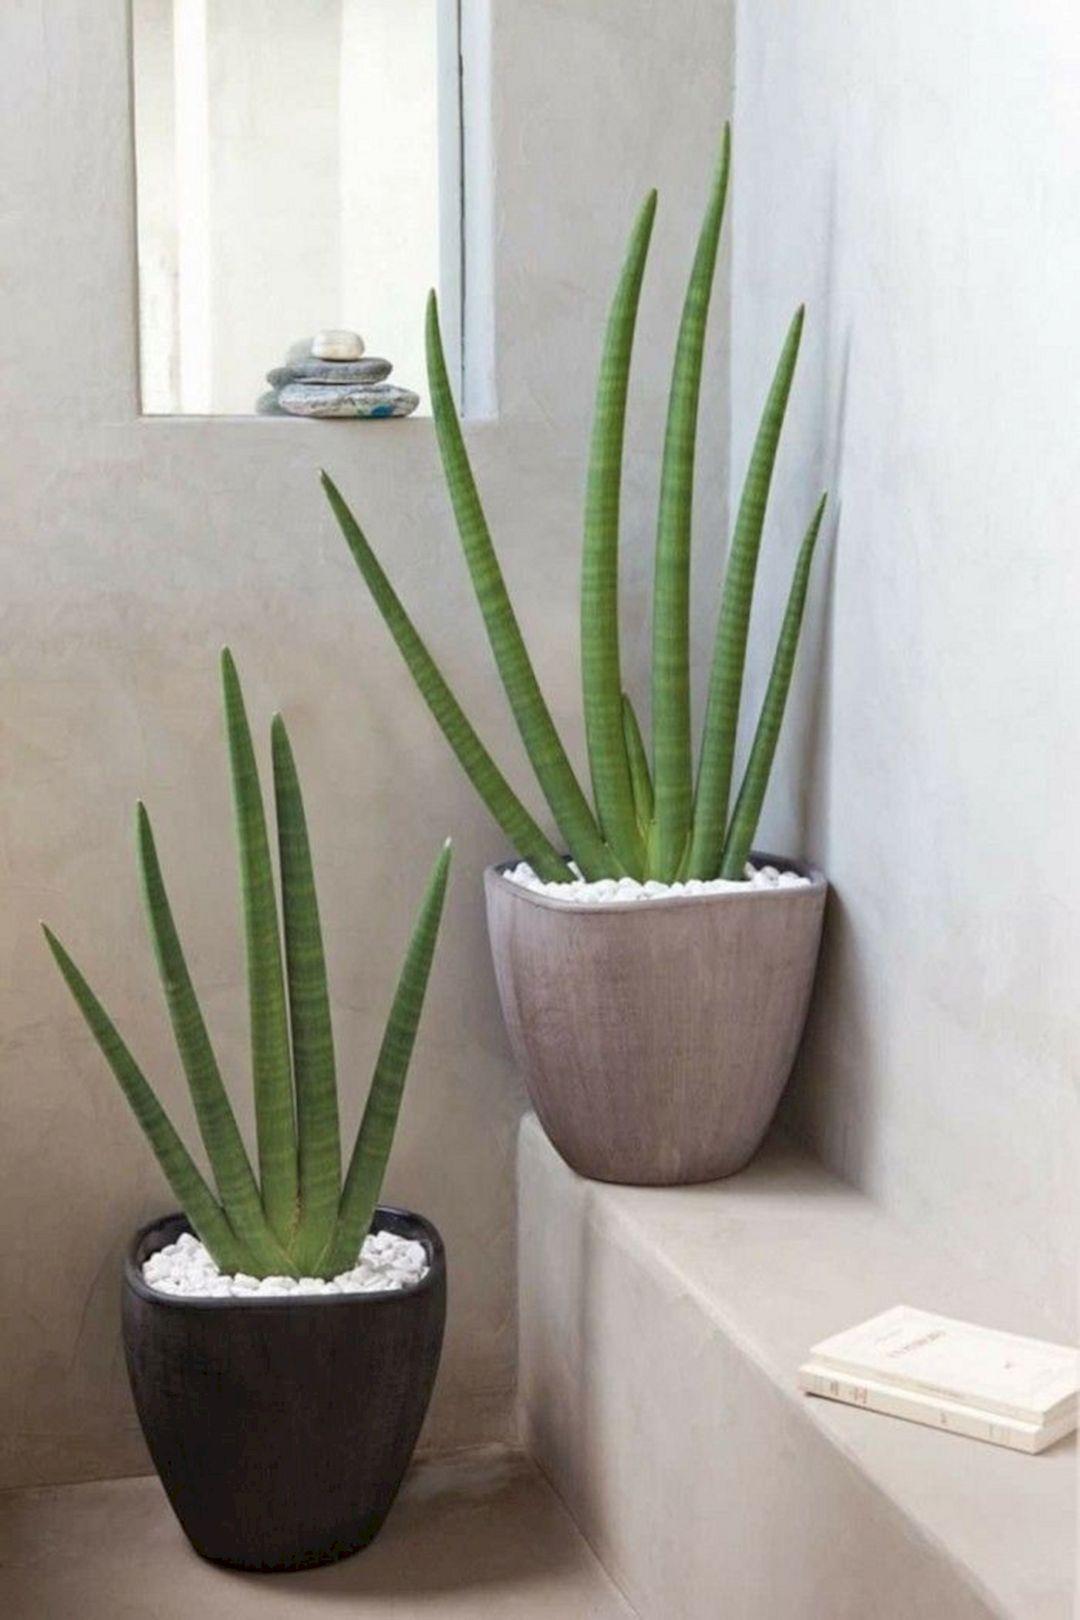 Sansevieria Plant Feng Shui 14 marvelous aloe vera plant ideas to create the freshness